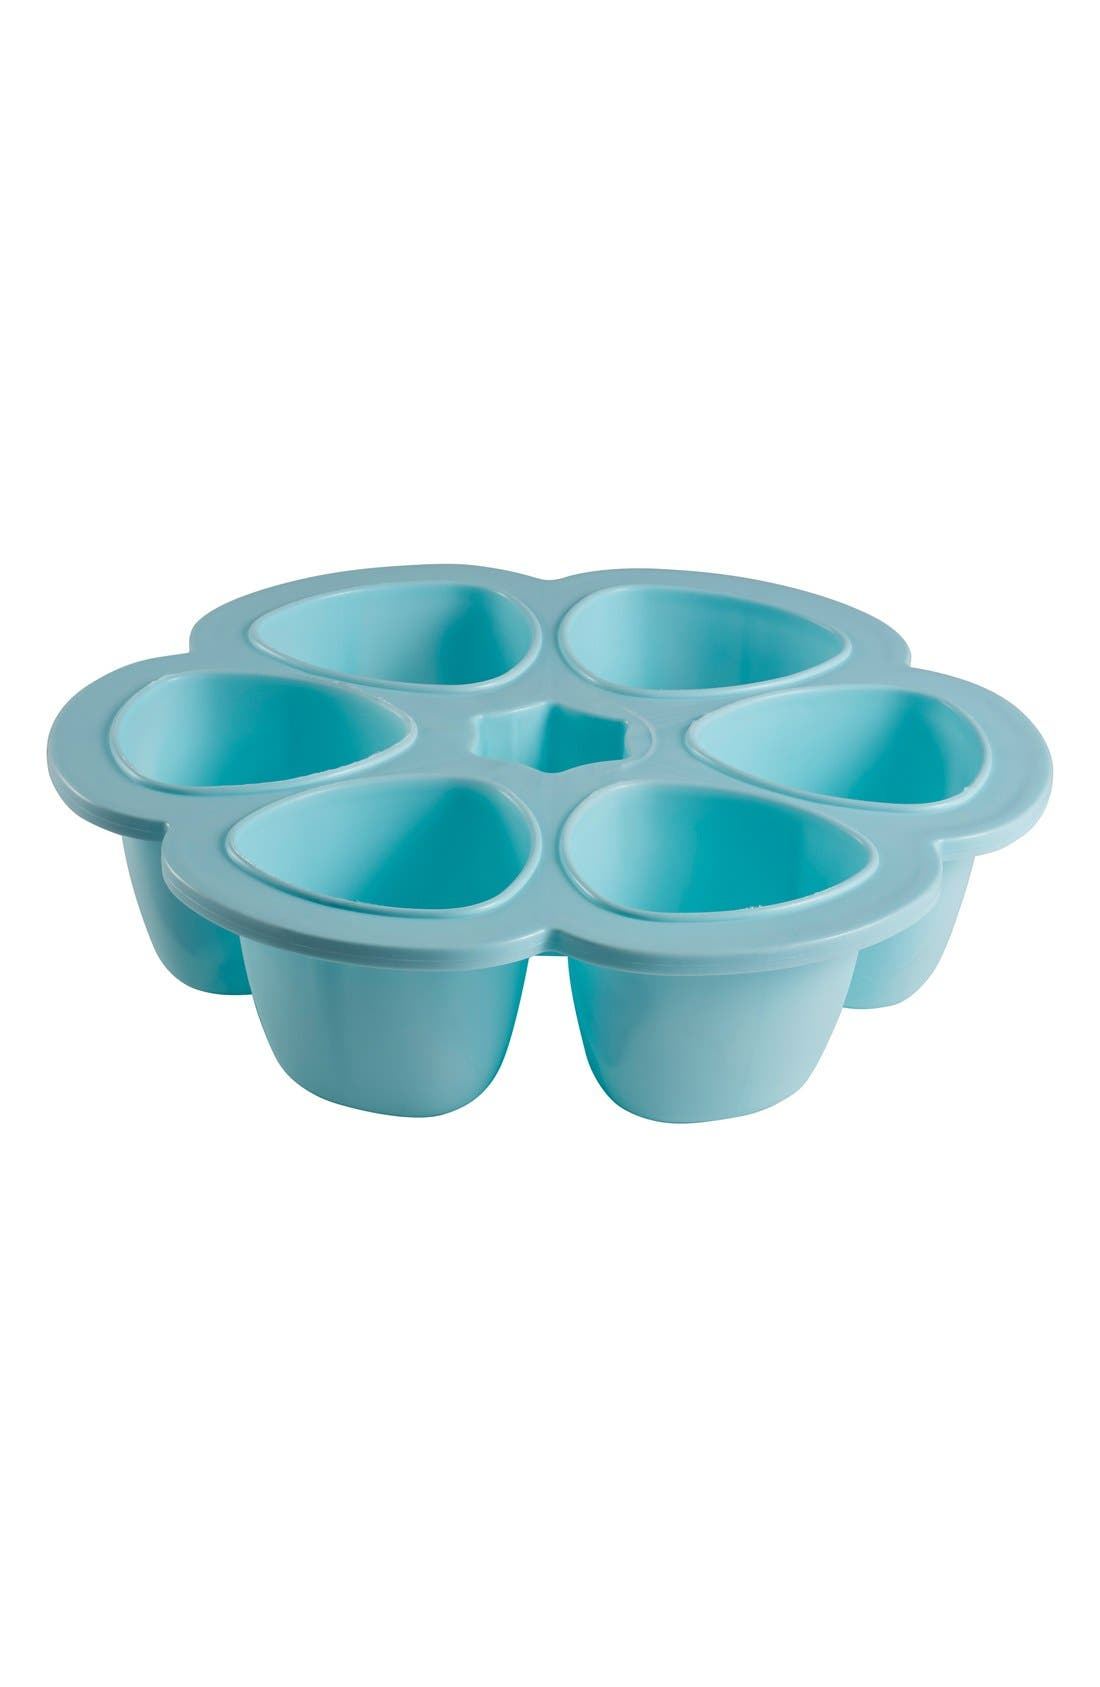 BÉABA 'Multiportions™' Silicone 3 oz. Food Cup Tray